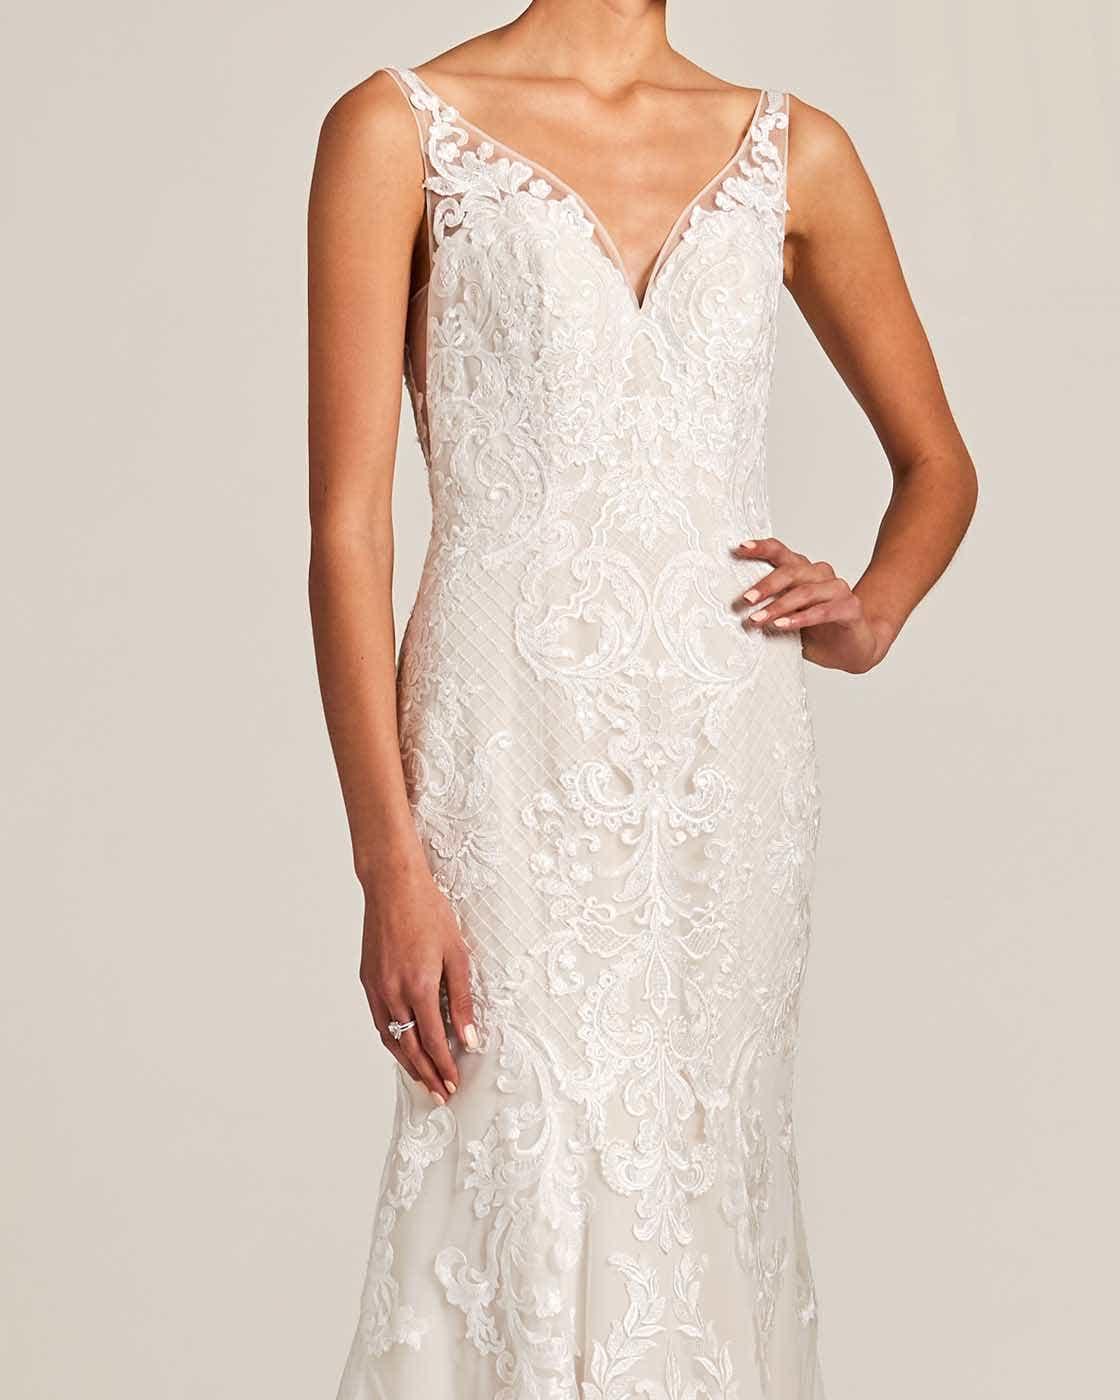 Vintage Style White Applique Wedding Gown - Detail